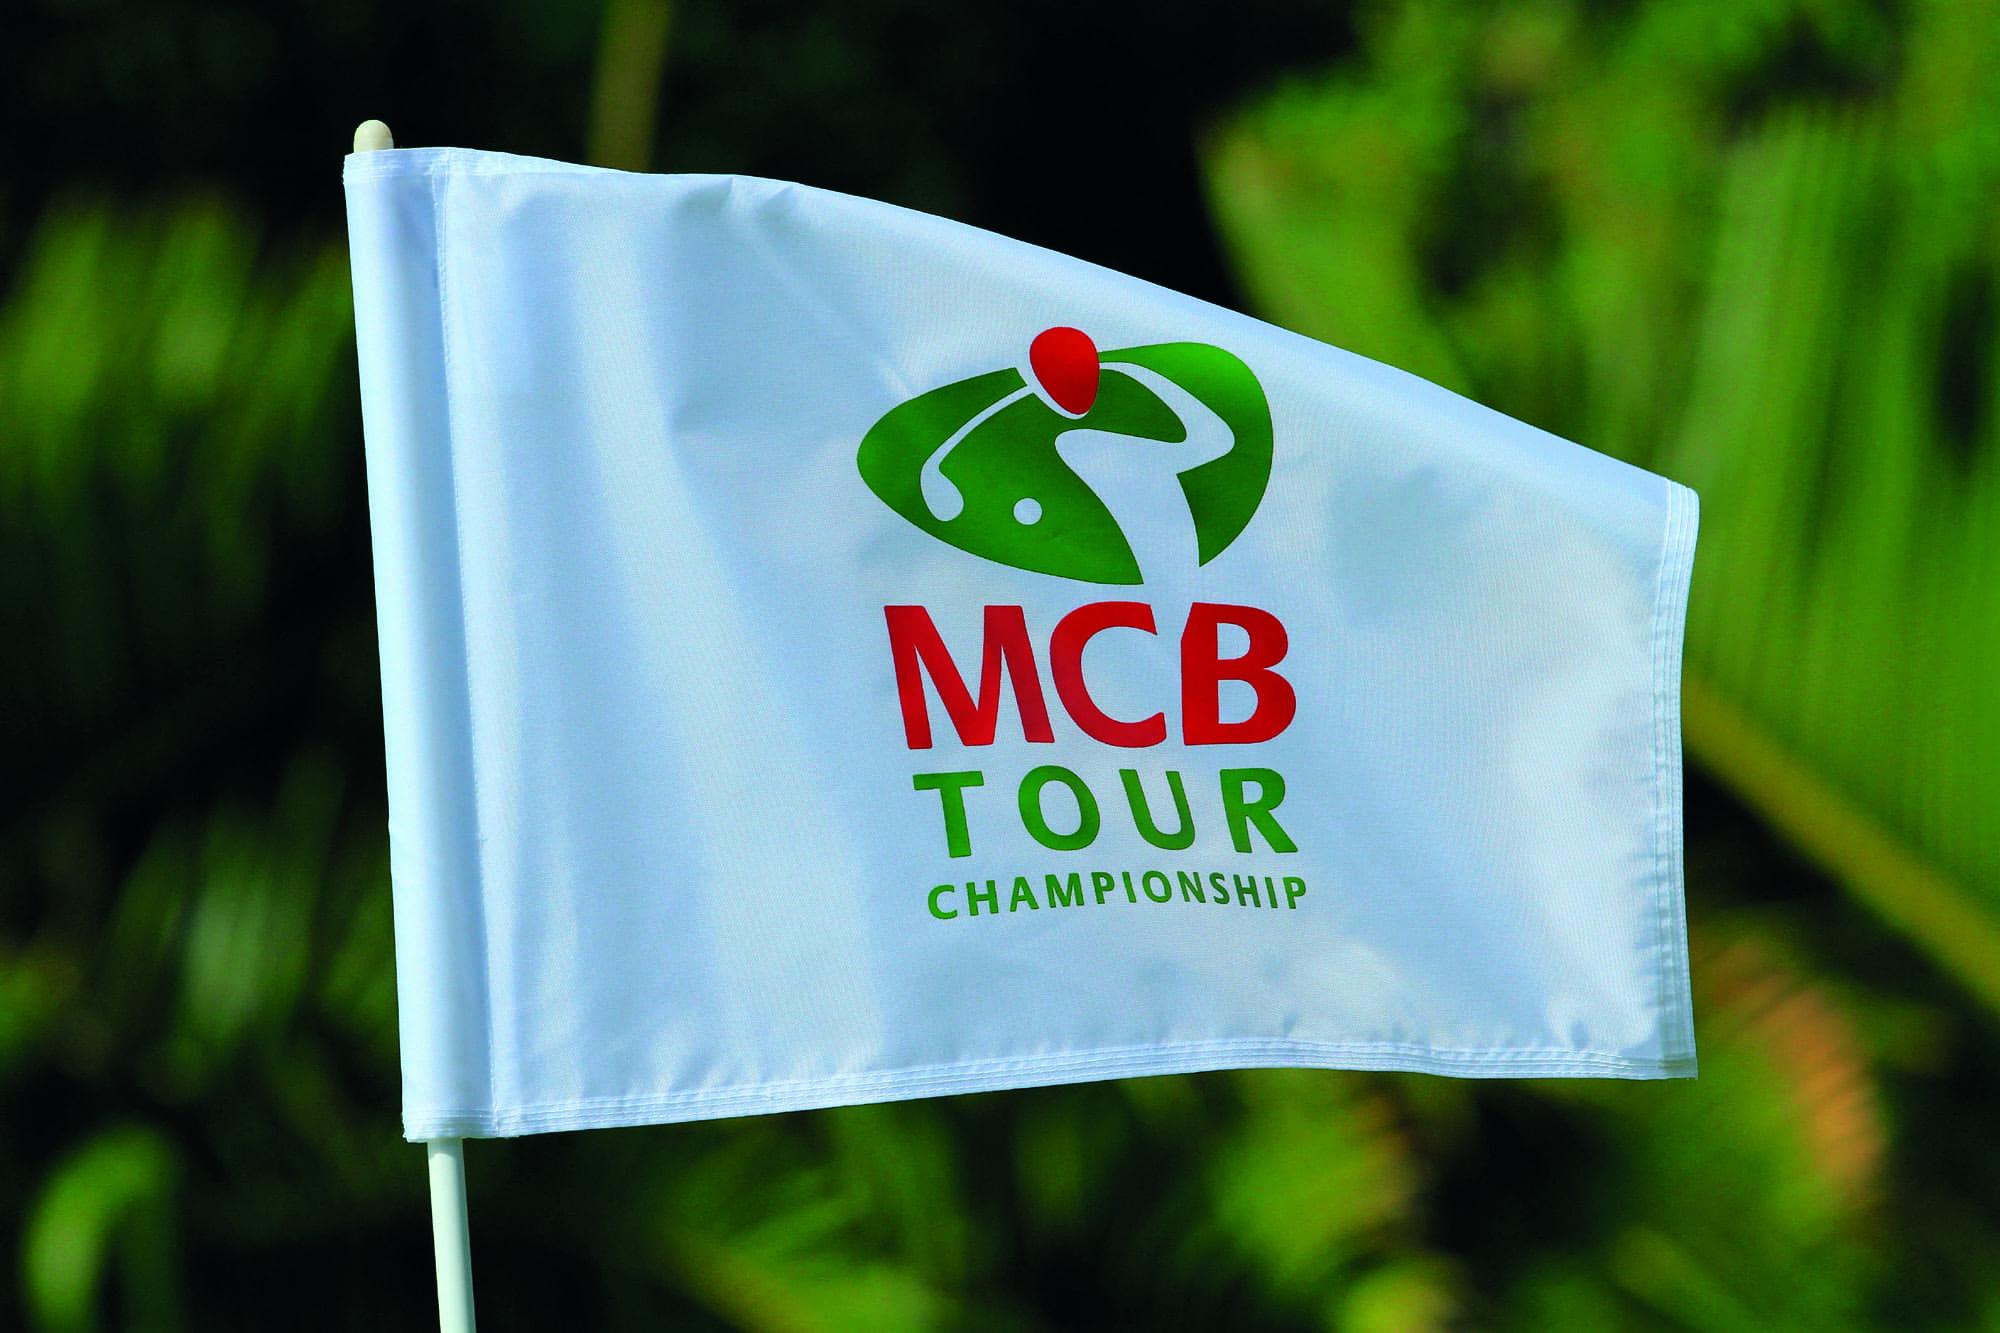 MCB Tour Championship, Mauritius